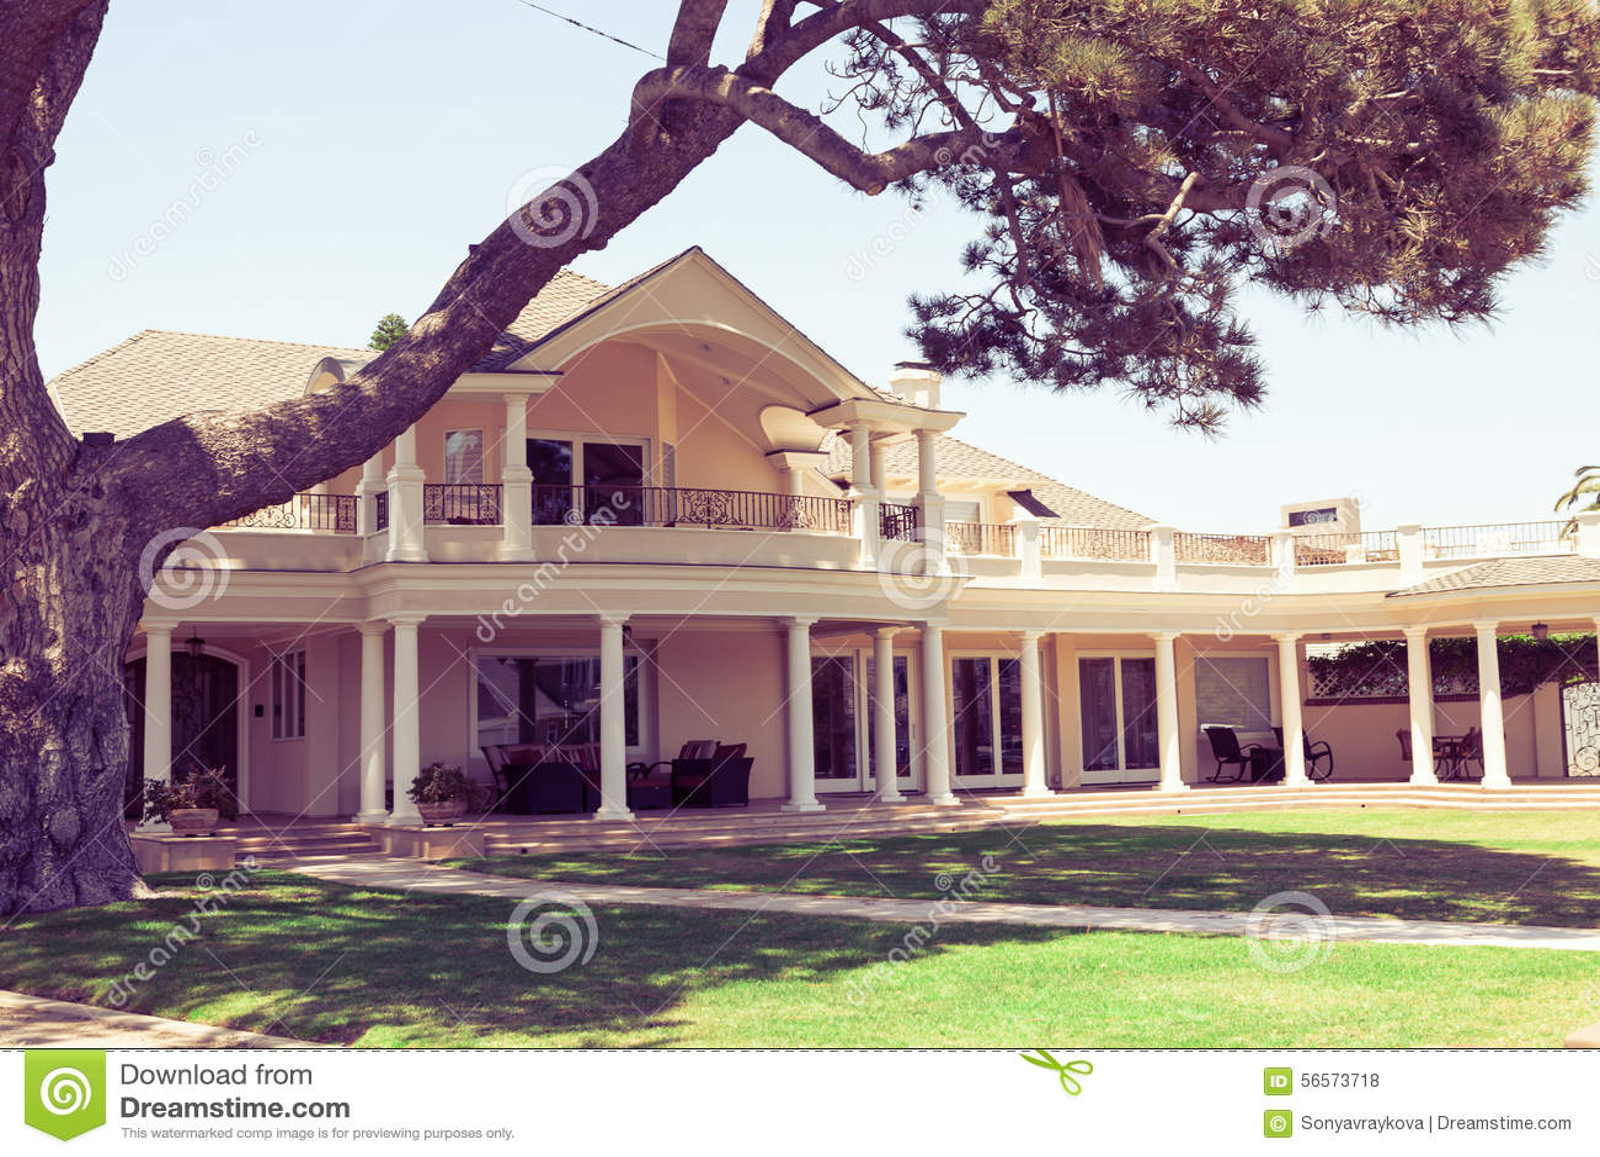 Download Σπίτι Hacienda - Coronado, Σαν Ντιέγκο ΗΠΑ Στοκ Εικόνες - εικόνα από πολυτέλεια, είσοδος: 56573718